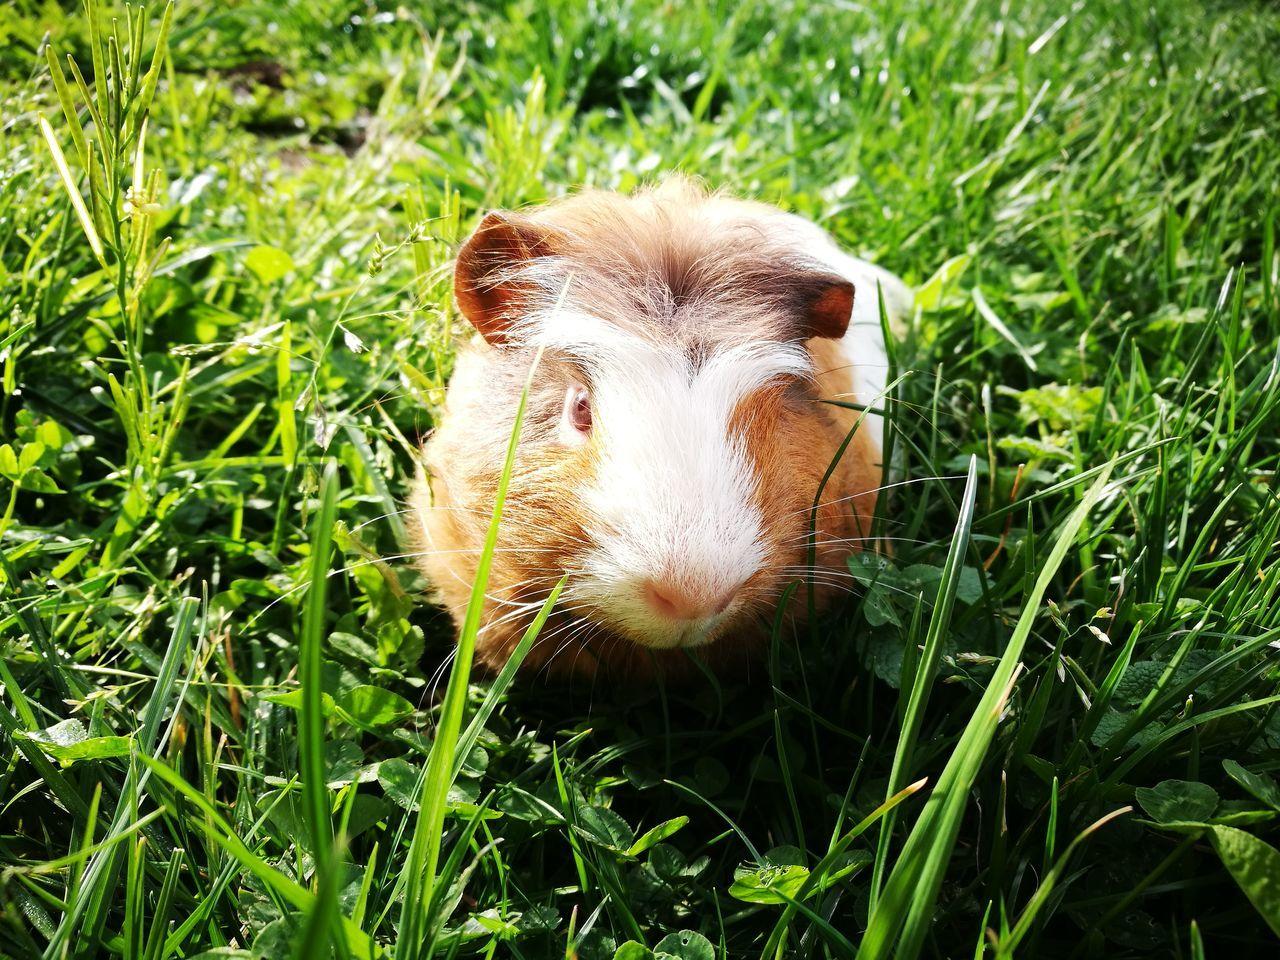 Pinky, the guinea pig. (Pinky, el conejillo de indias.) Guinea Pig Nature No Filters Needed Sunlight Field Grass Pets Conejillo De Indias Natural Sin Filtros Luz Solar Campo Yerba Mascotas